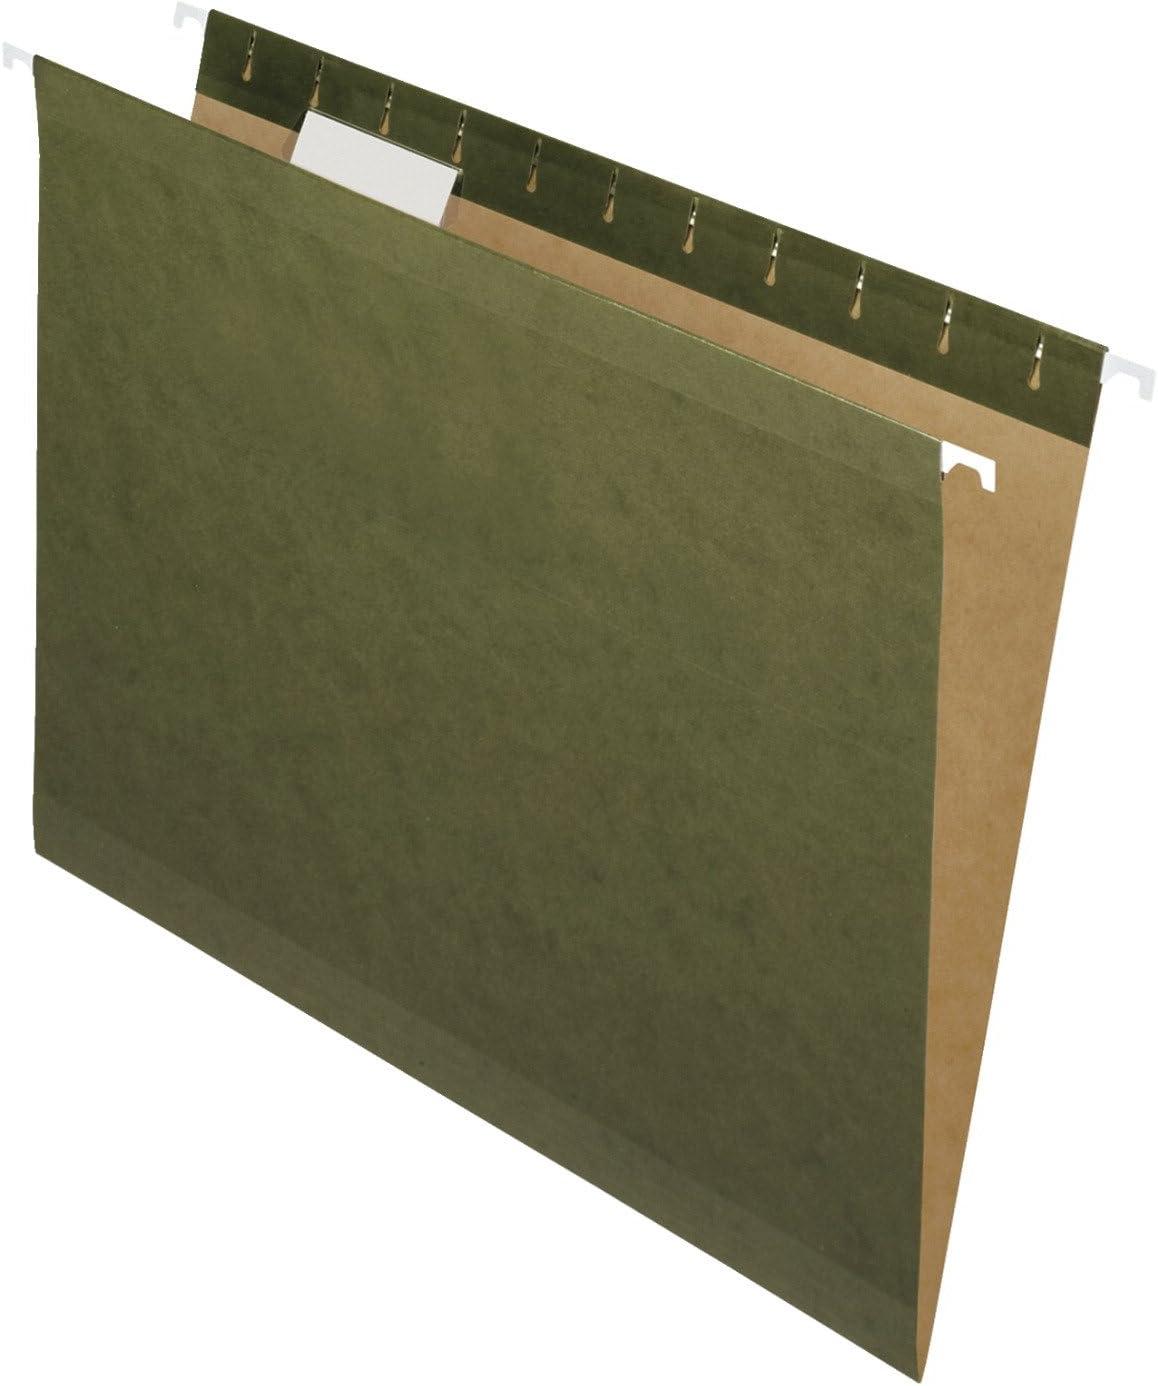 Pendaflex 415215 Hanging File Folders